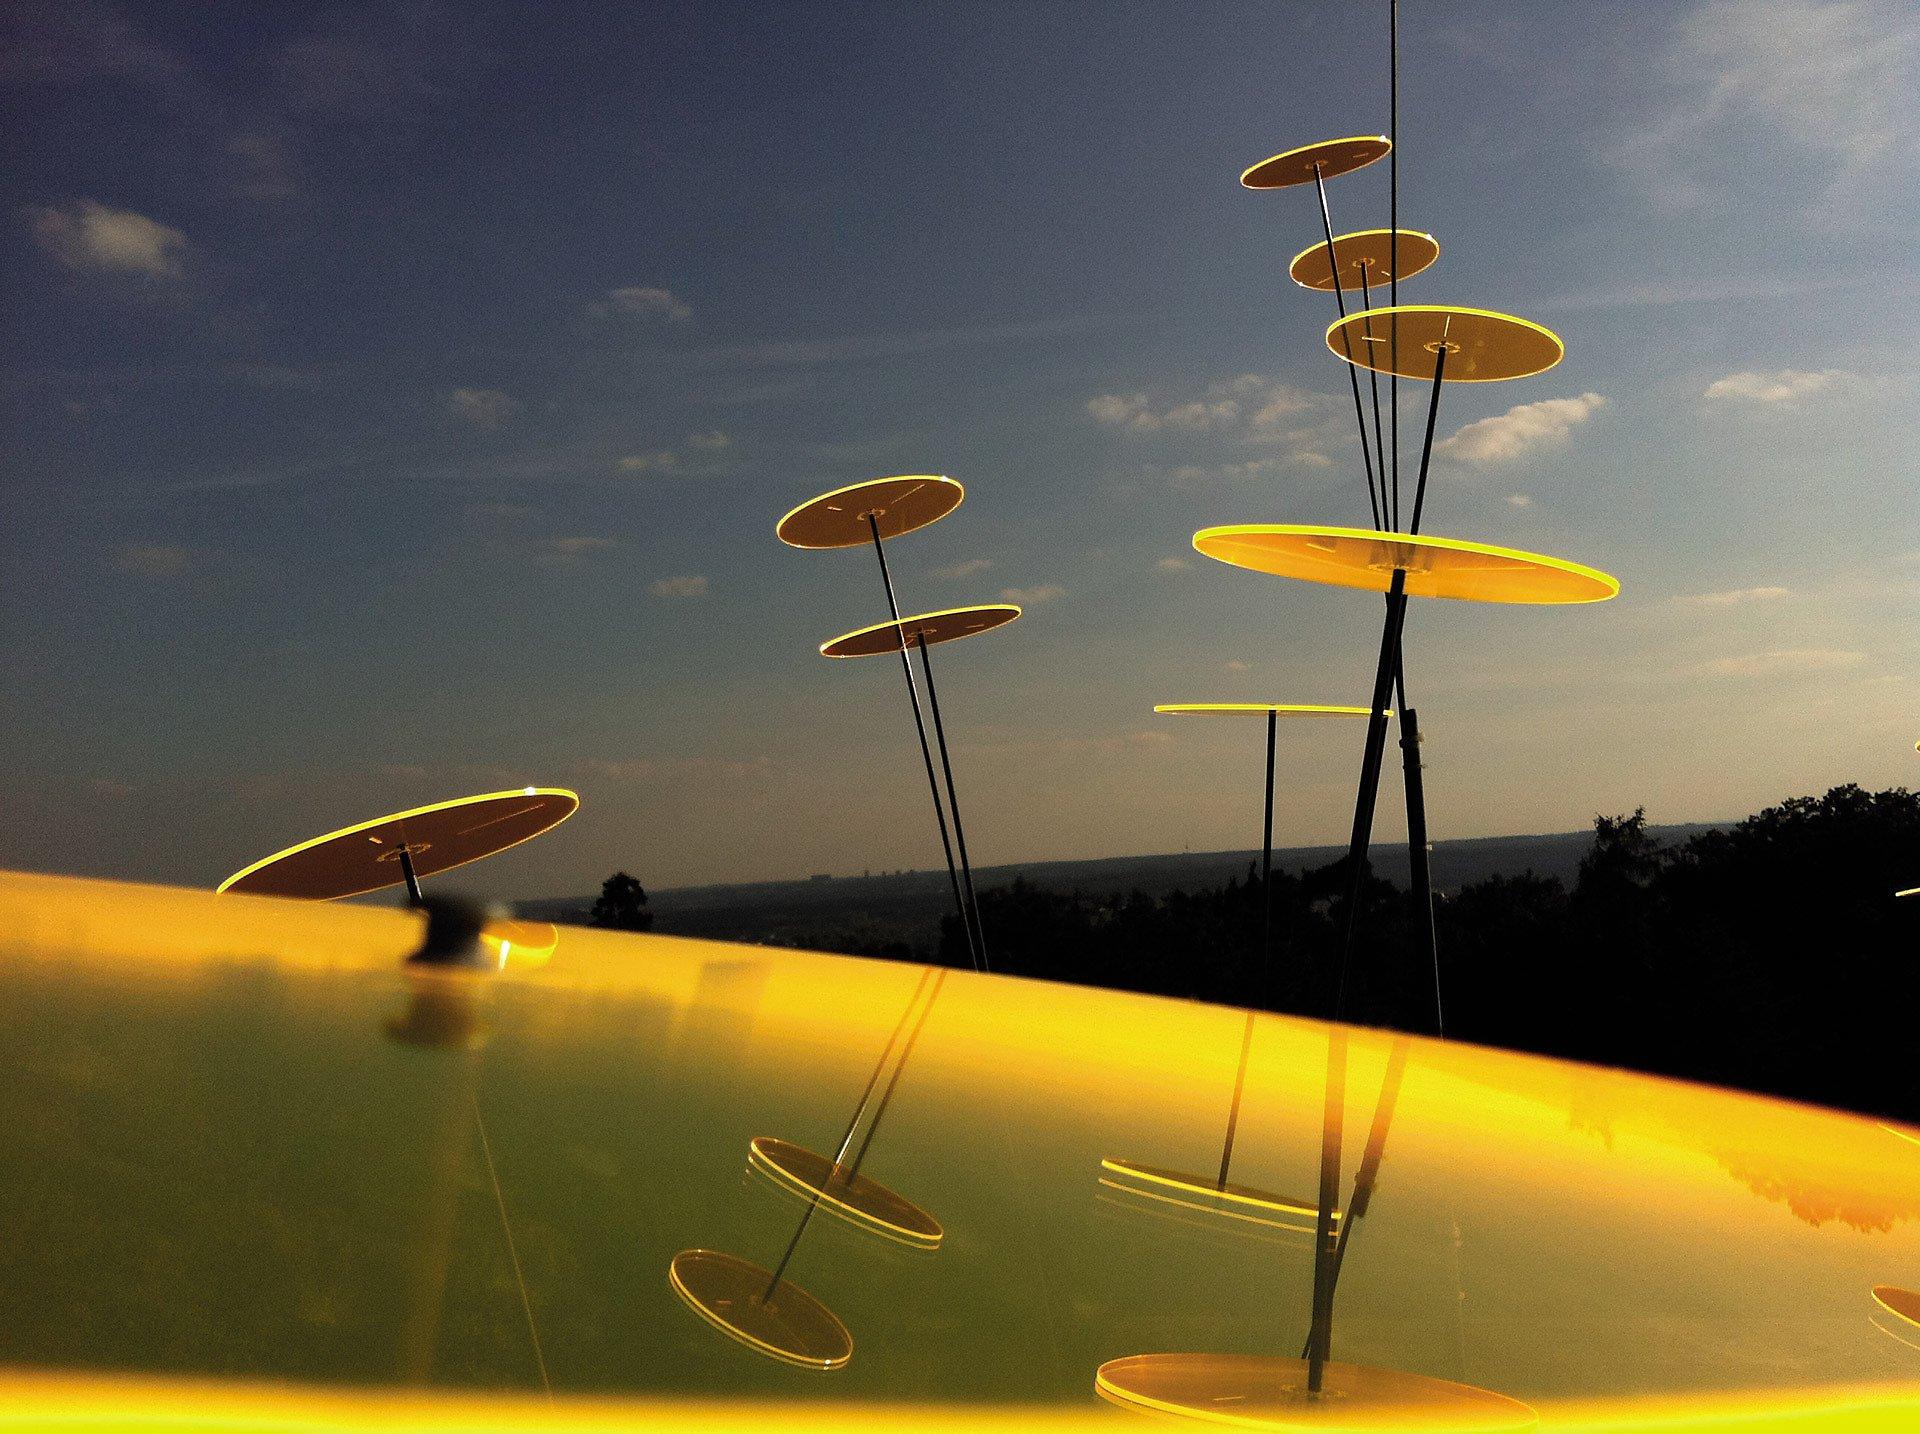 Cazador Del Sol 3 Sonnenfänger 15cm Durchmesser Gelb Weltbildde